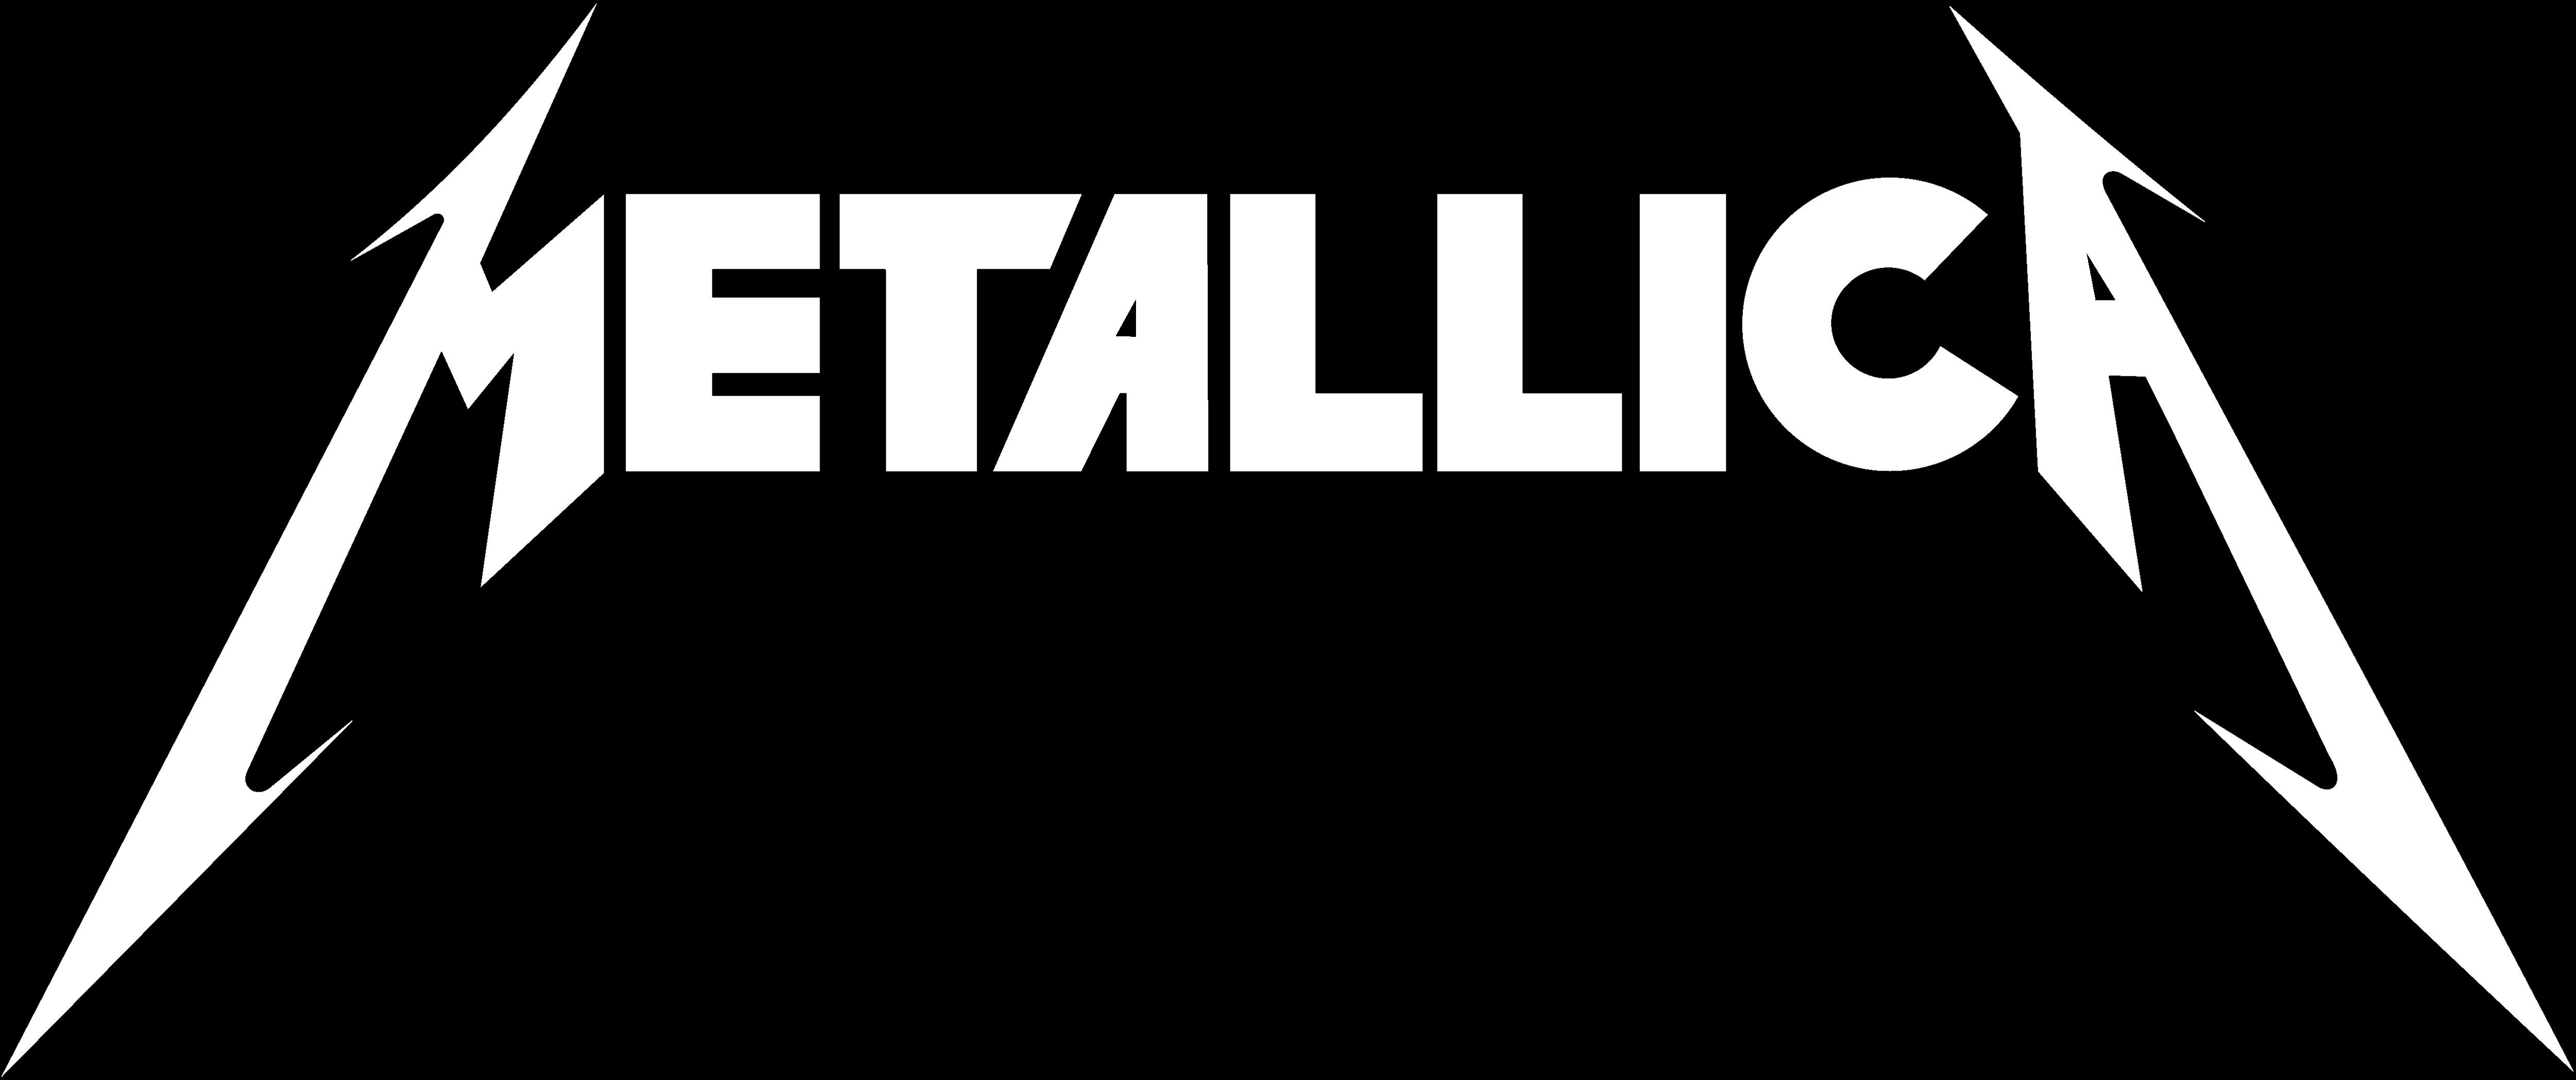 https://upload.wikimedia.org/wikipedia/commons/b/b7/Metallica_logo.png